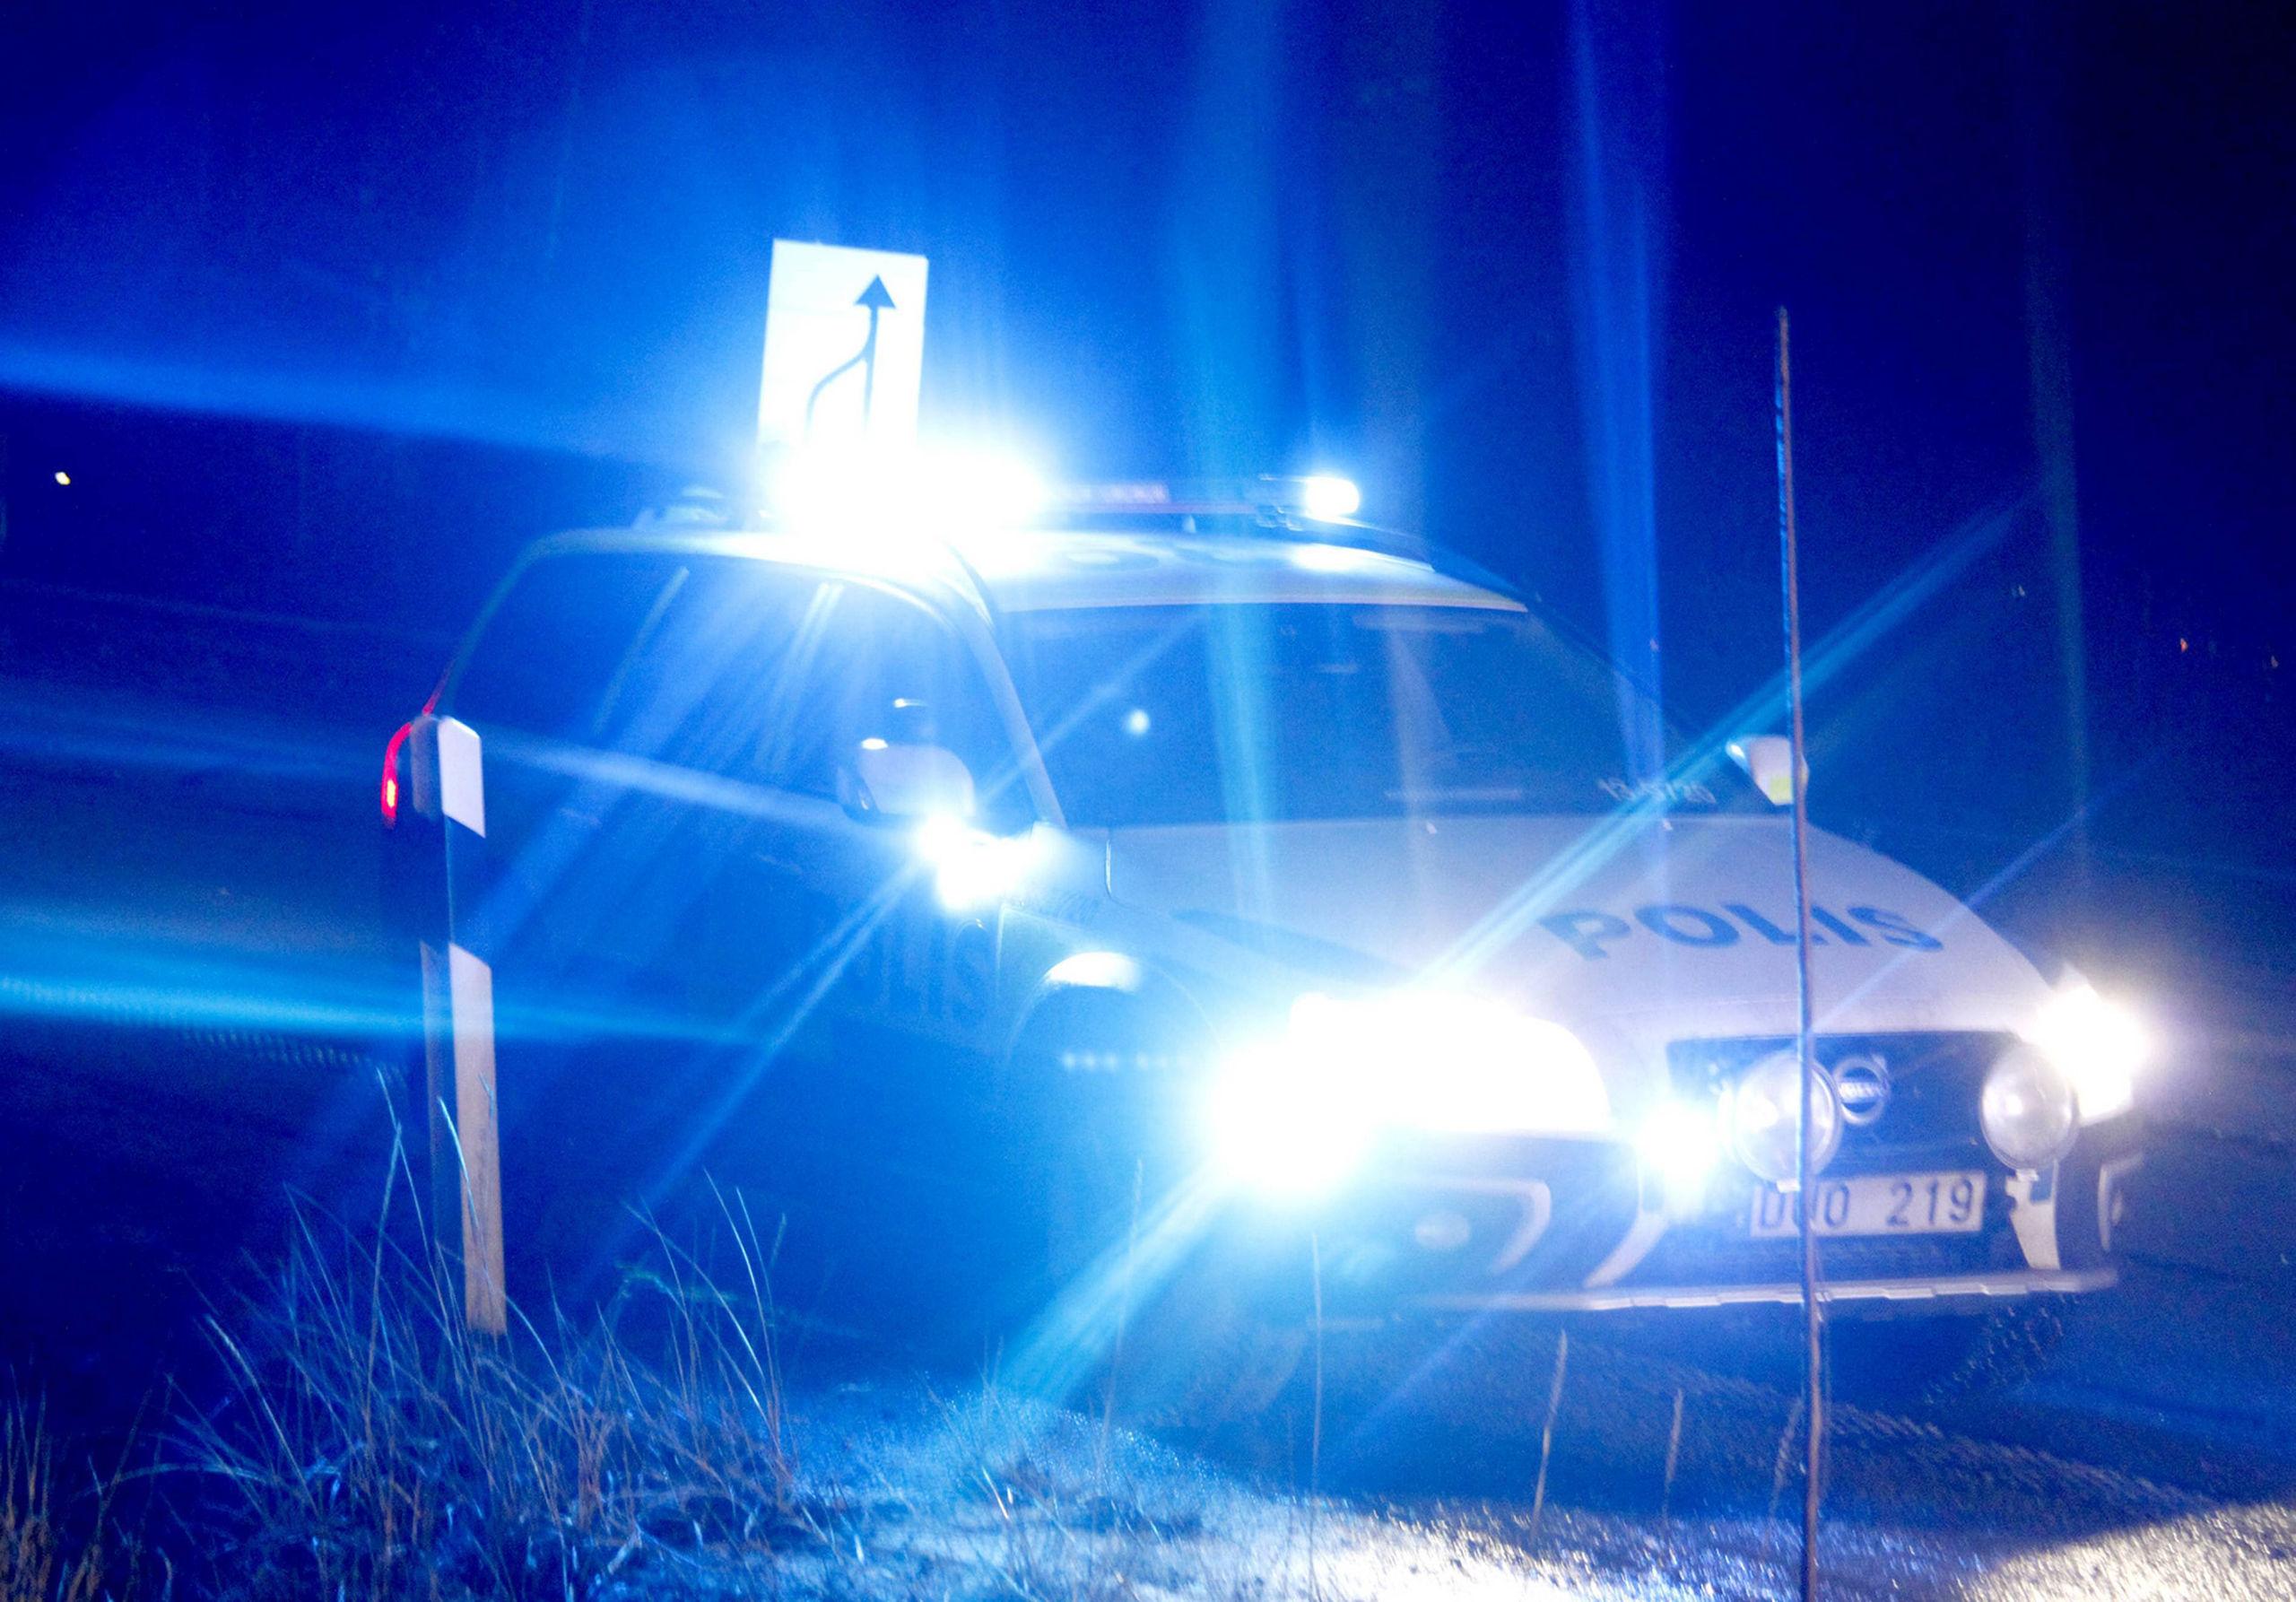 Polis misstanks for sexofredande